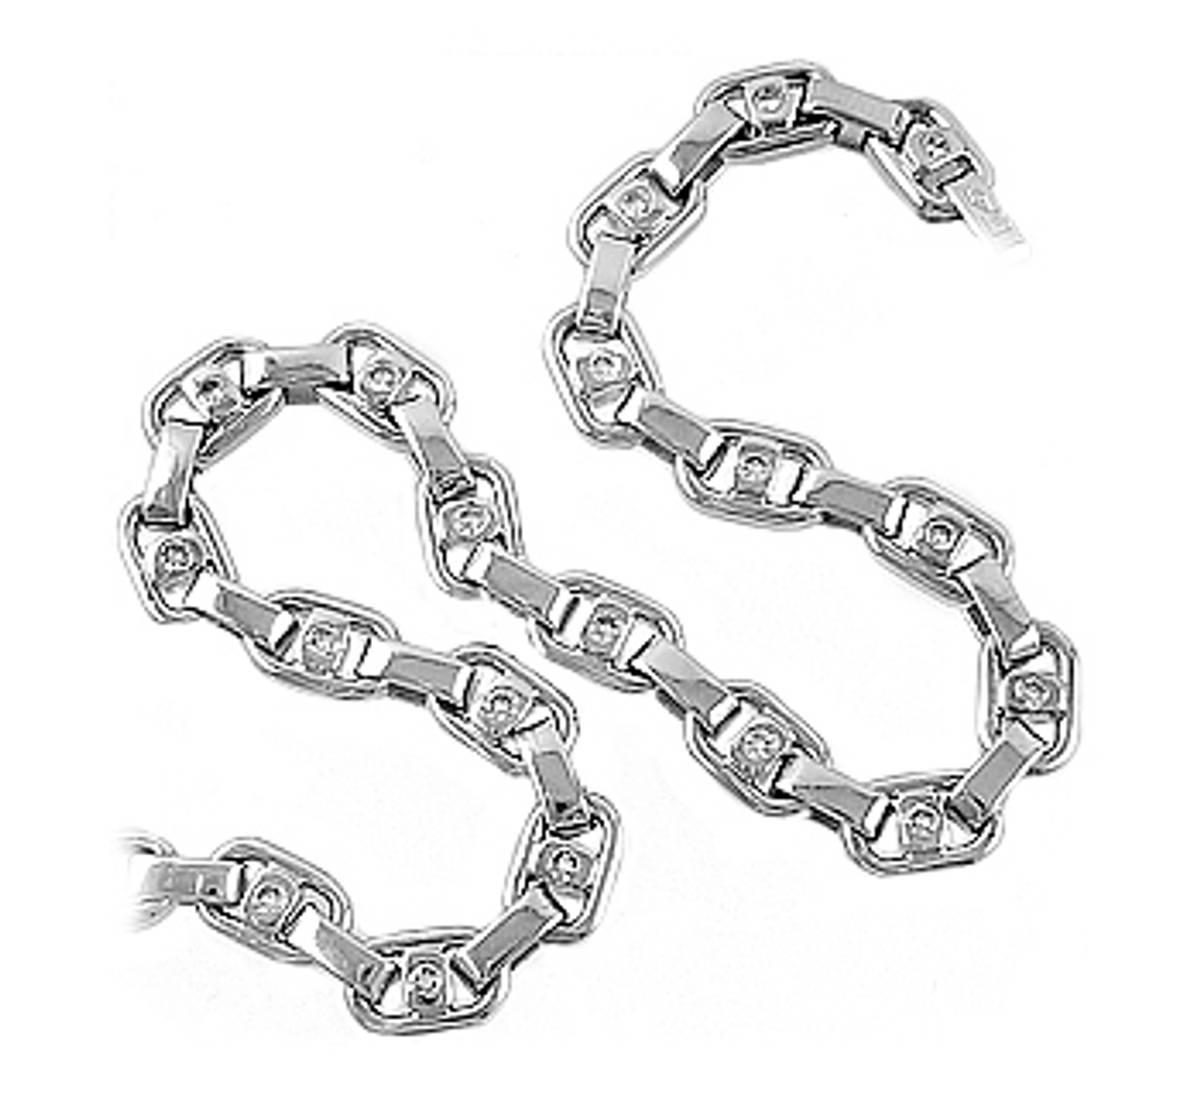 18 carat white gold bracelet with 0.40cts diamonds